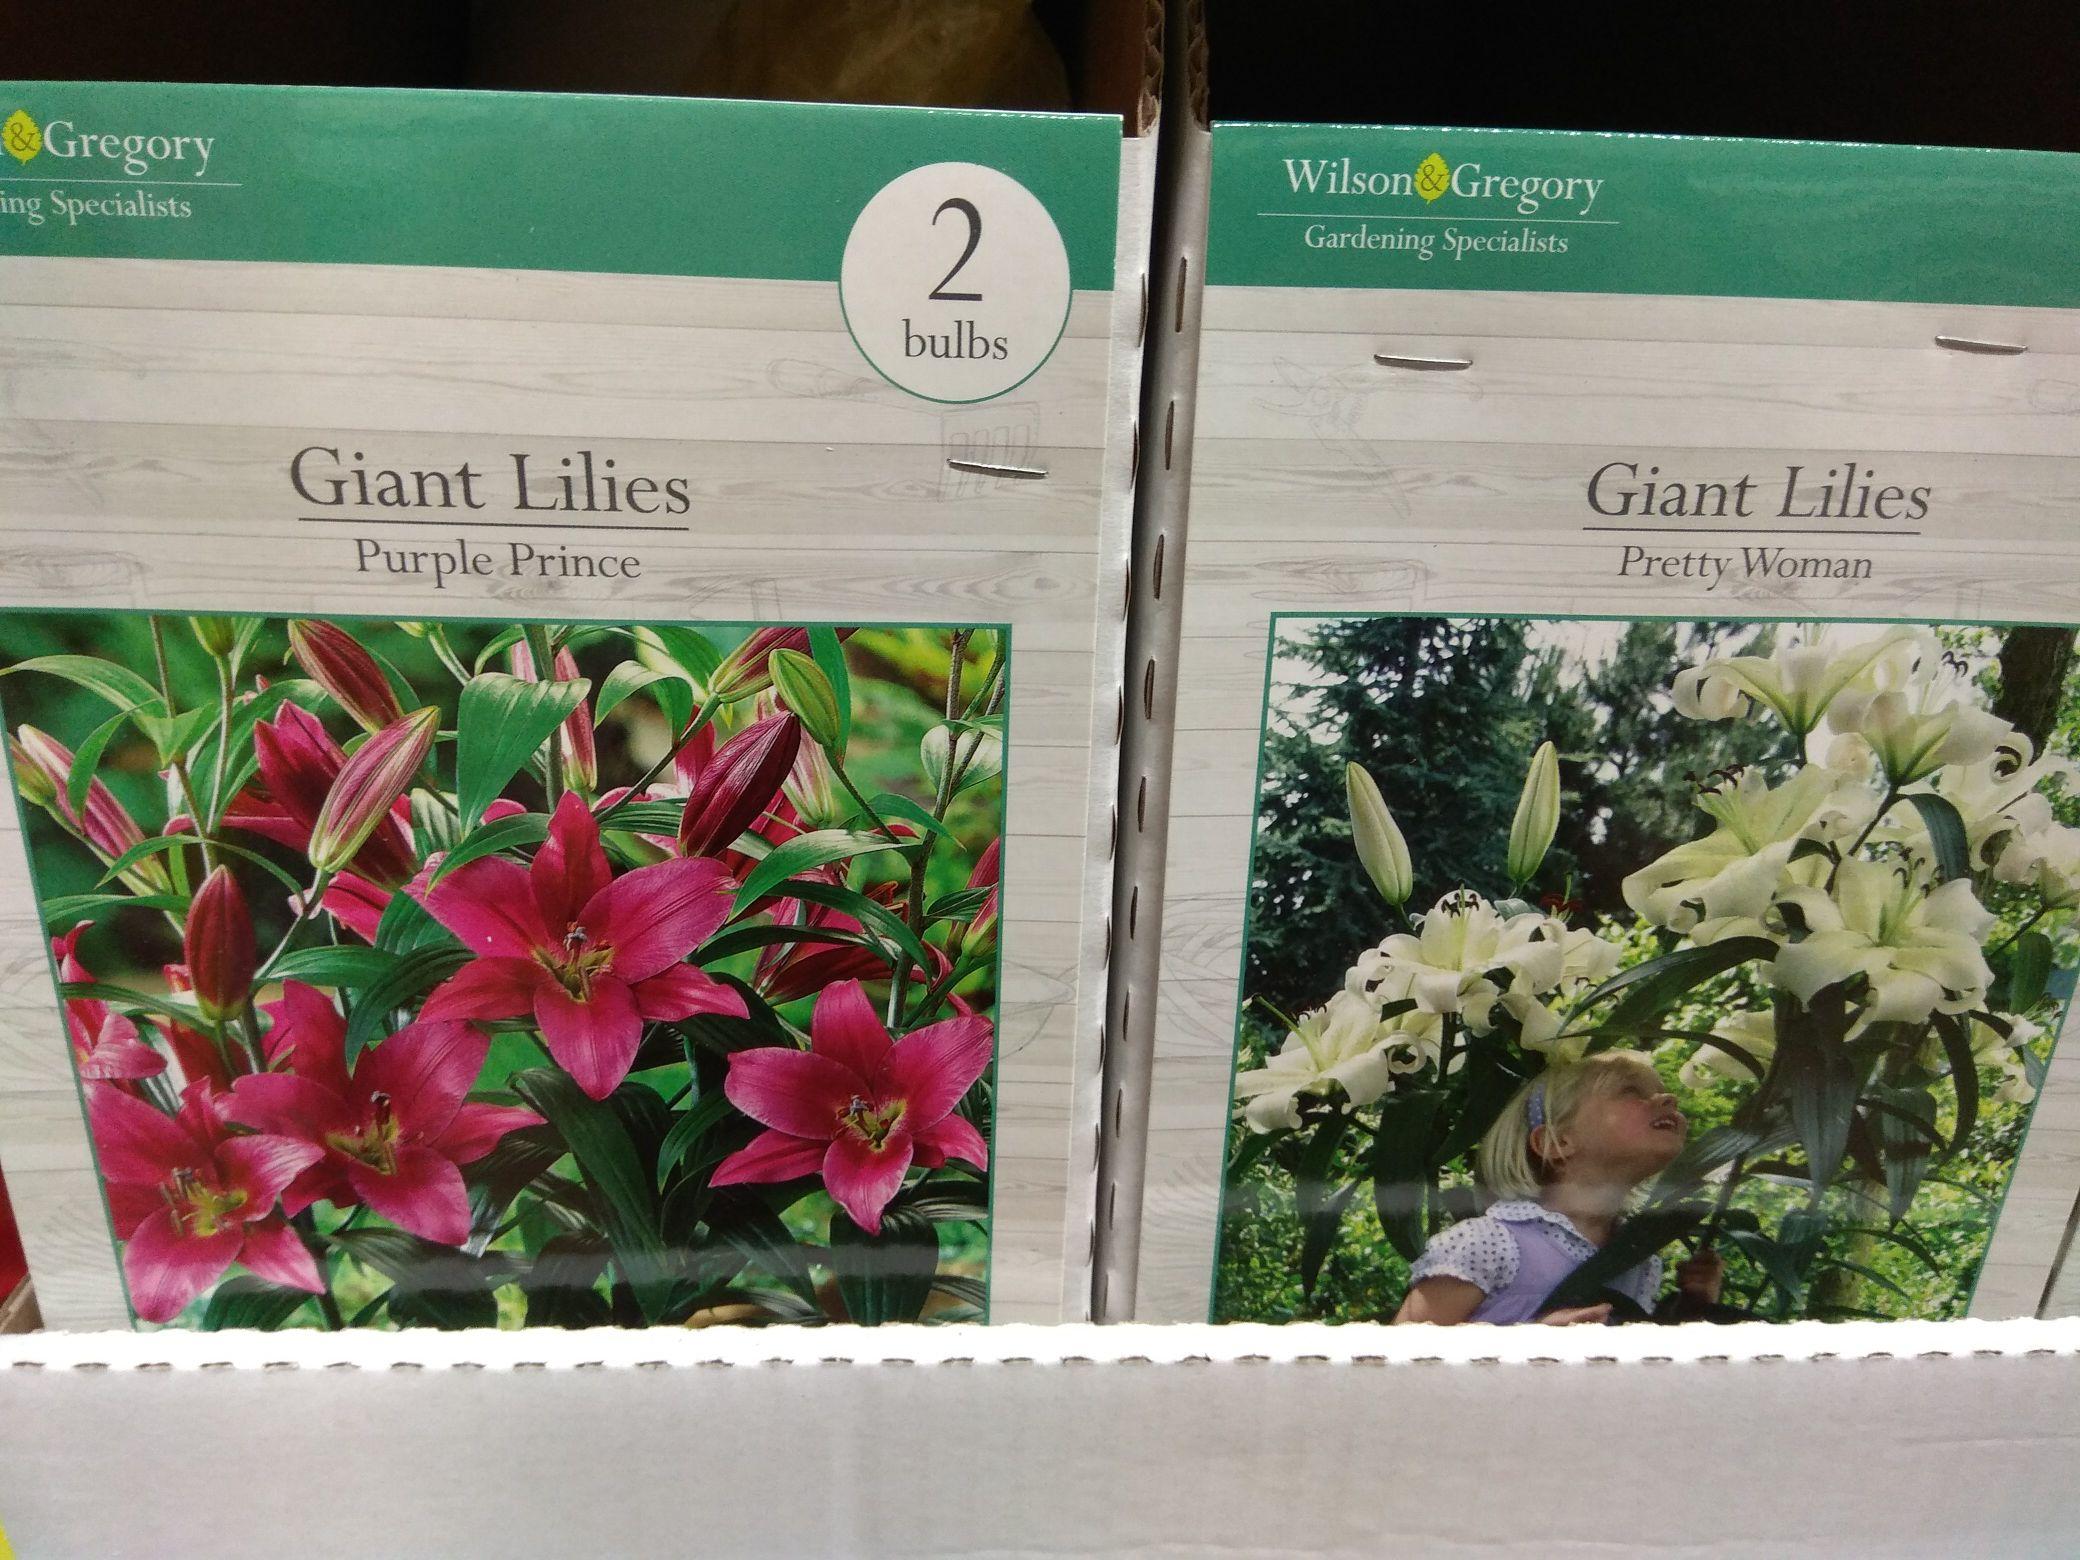 2 x Giant Lilies Pretty Woman / Purple Prince bulbs £1 @ Poundland